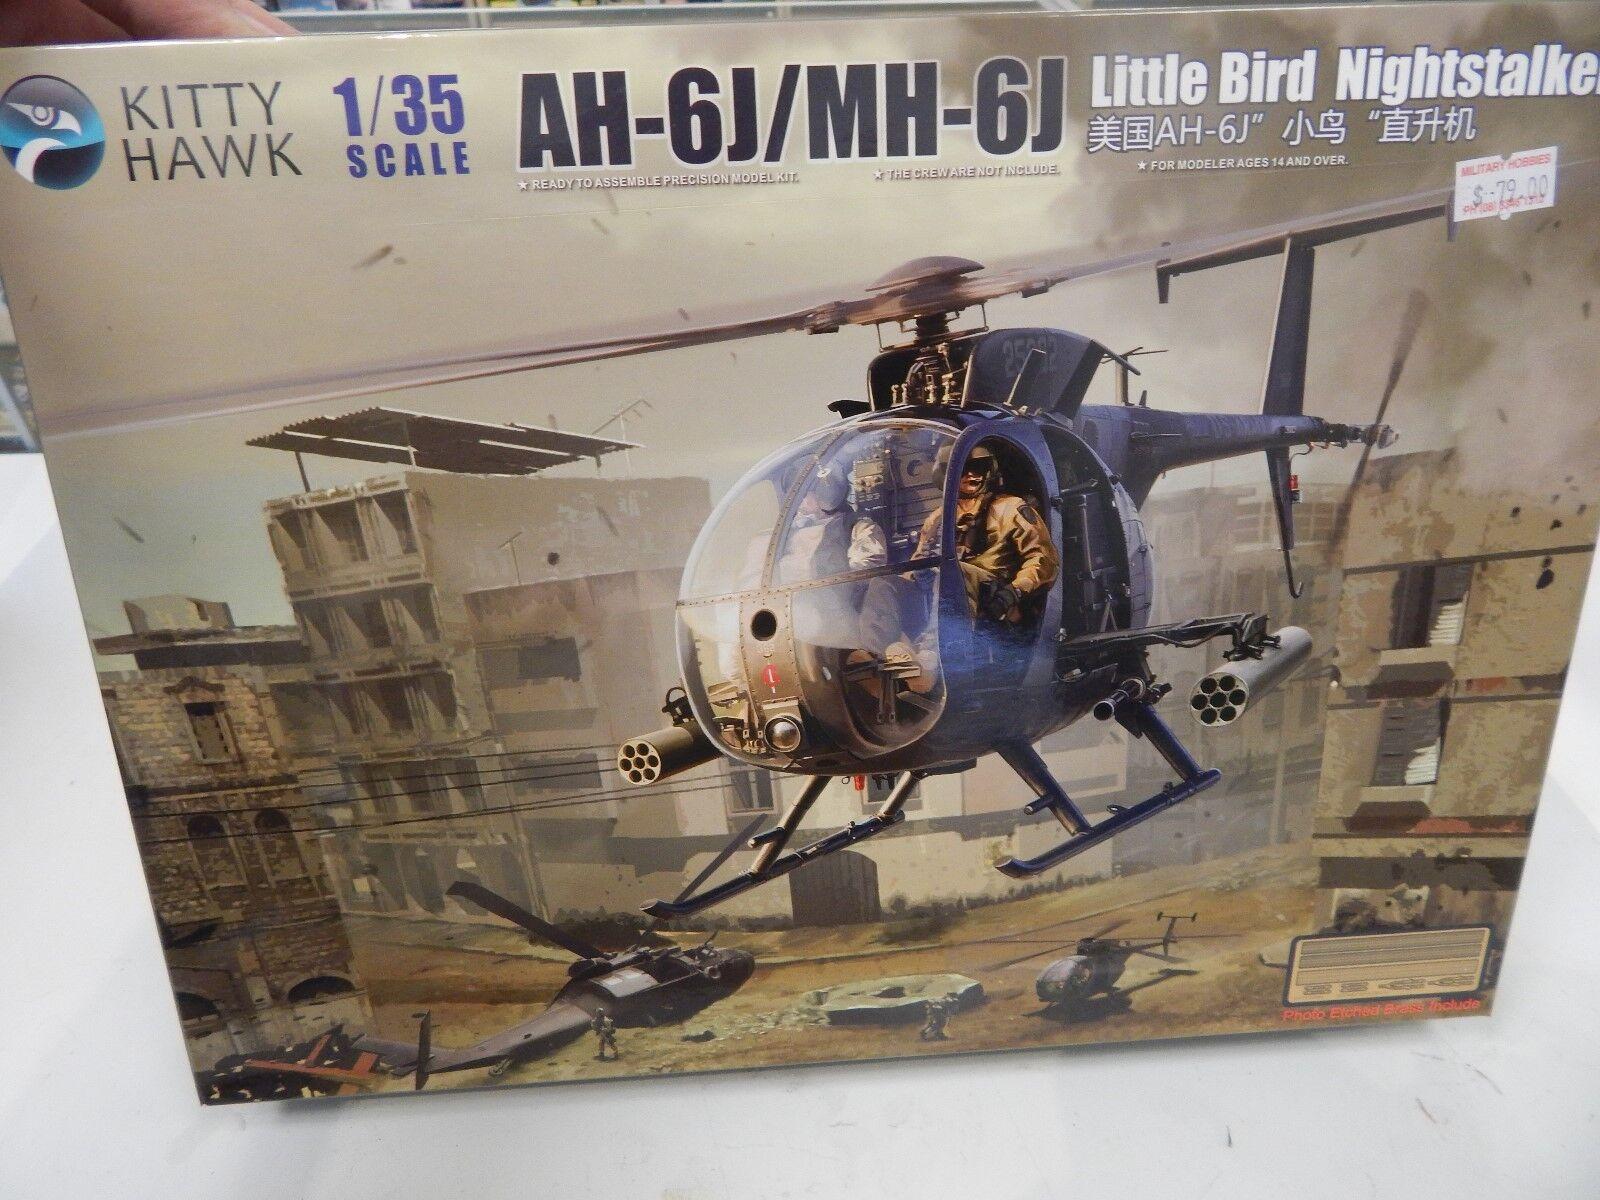 Kitty Hawk 1 35 plastic model kit AH-6J MH-6J Little Bird